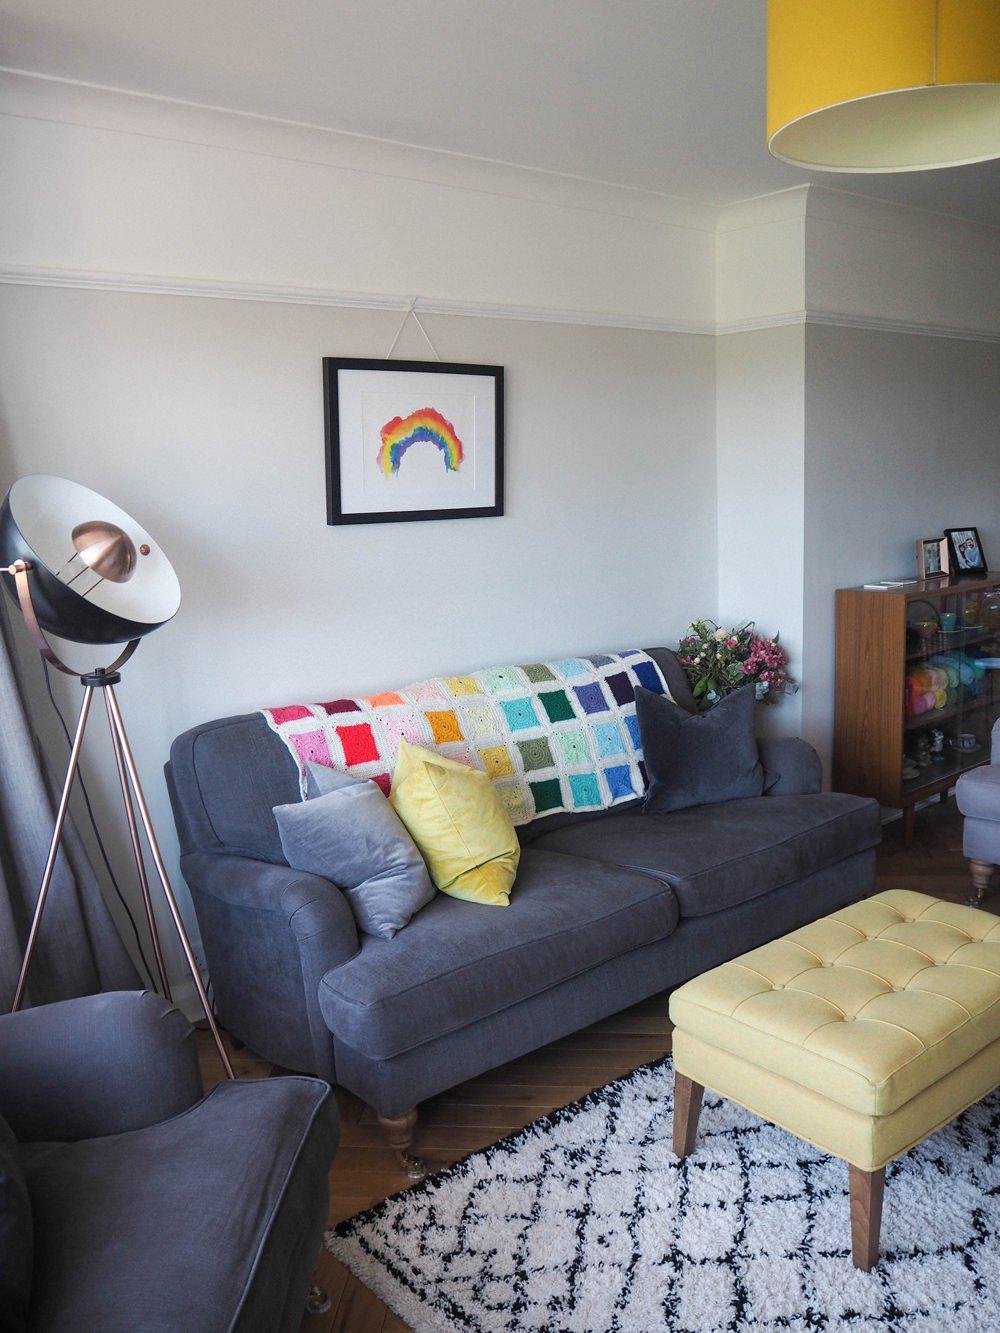 1930s House Living Room Renovation 1930s House Living Room Renovation Velvet Cushions Mustard Yellow Grey Sofa Rainbow Crochet Blanket Print Footstool Lampshade La Redoute Rug